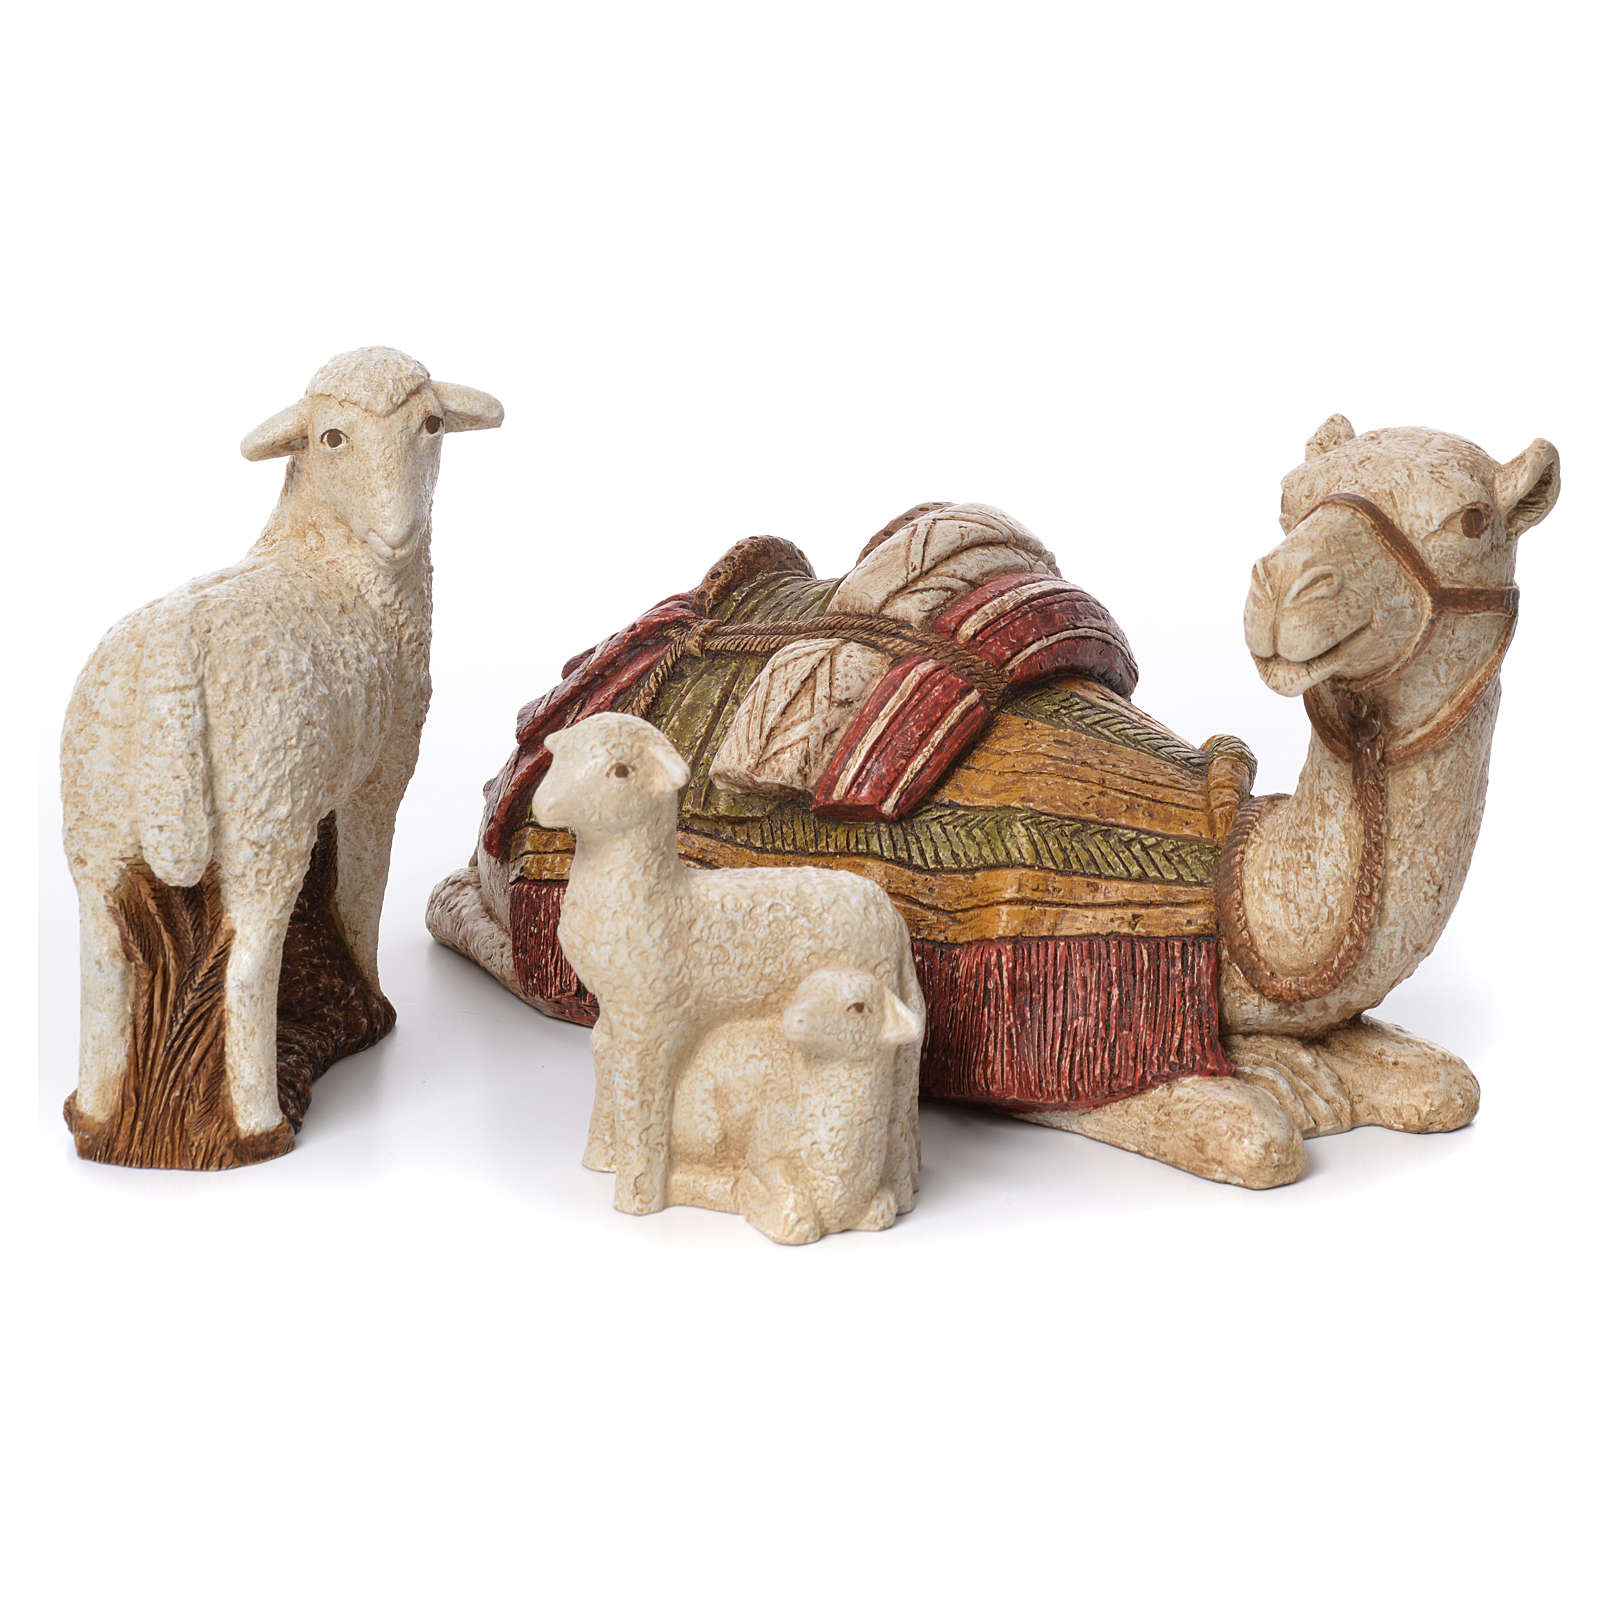 Rural Nativity Scene by Behleem nuns 4